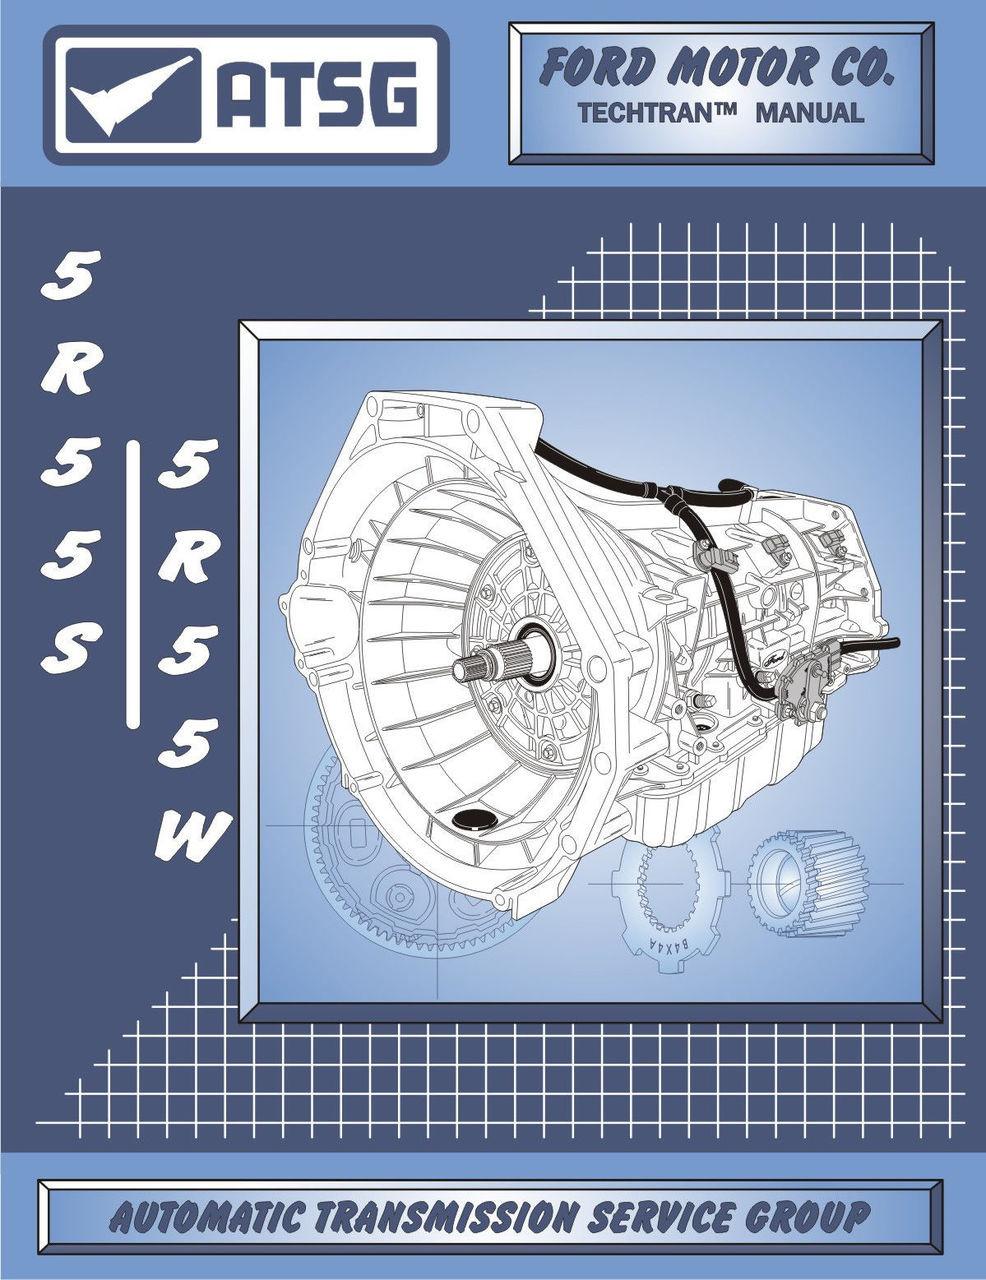 ATSG Tech Manual 5R55W 5R55S Ford Mercury Jaguar 2002-On Rebuild Guide Book  New